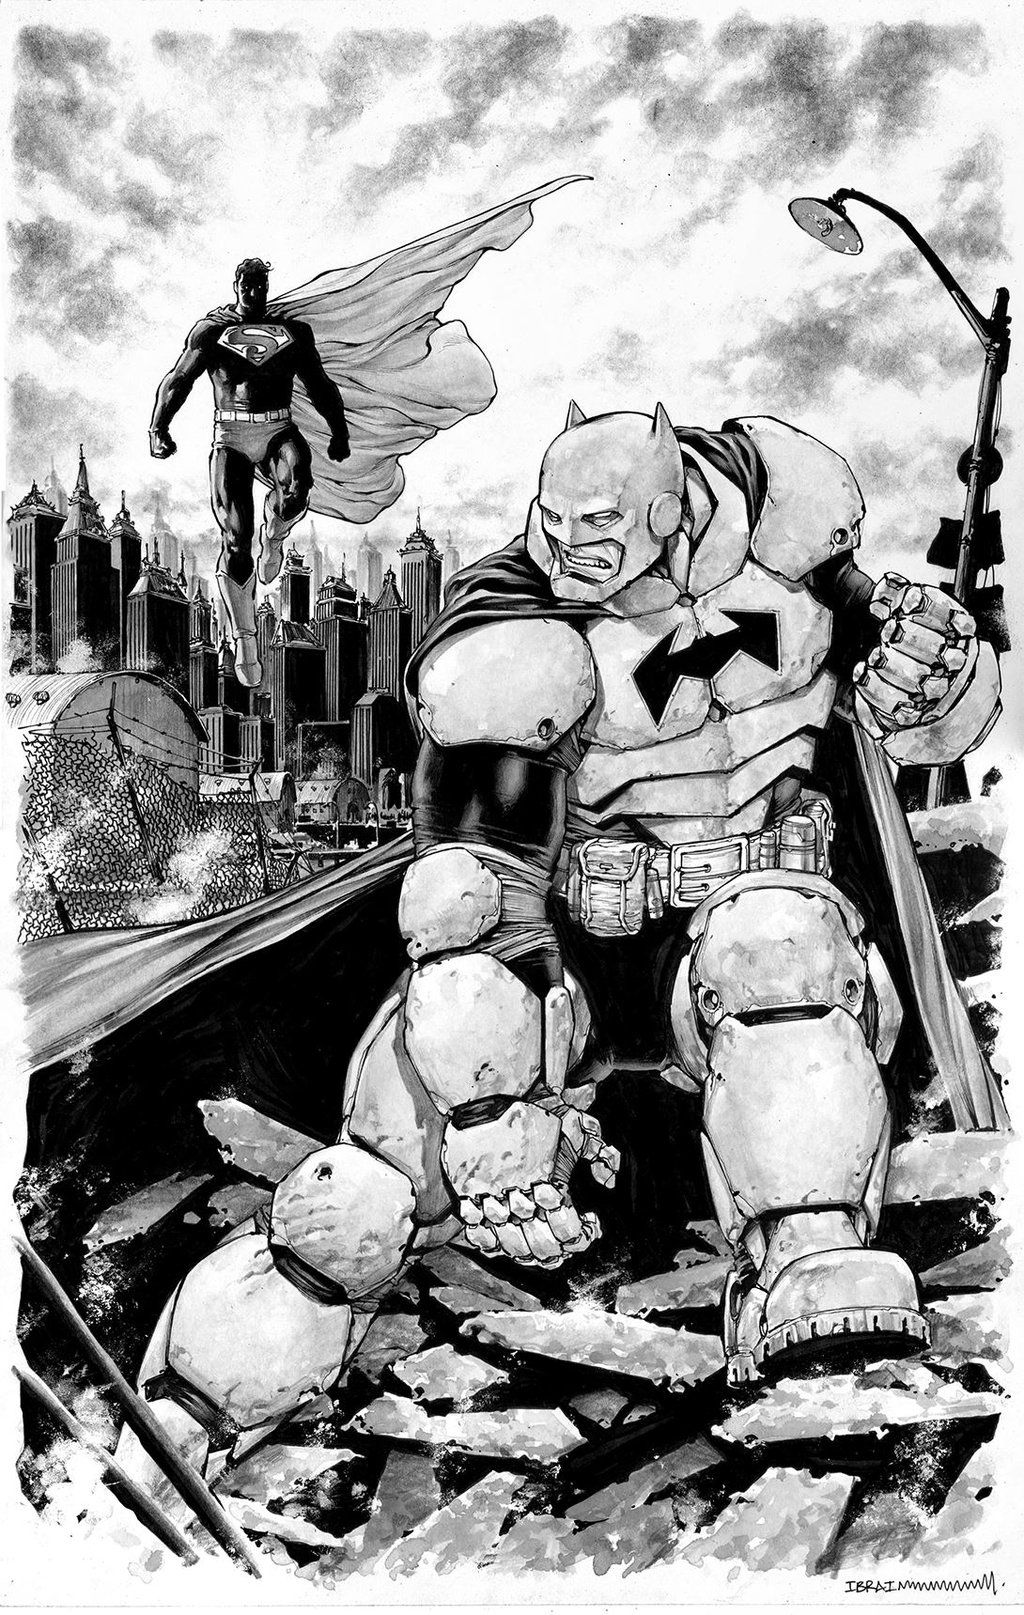 The Dark Knight Returns by Ibraim Roberson